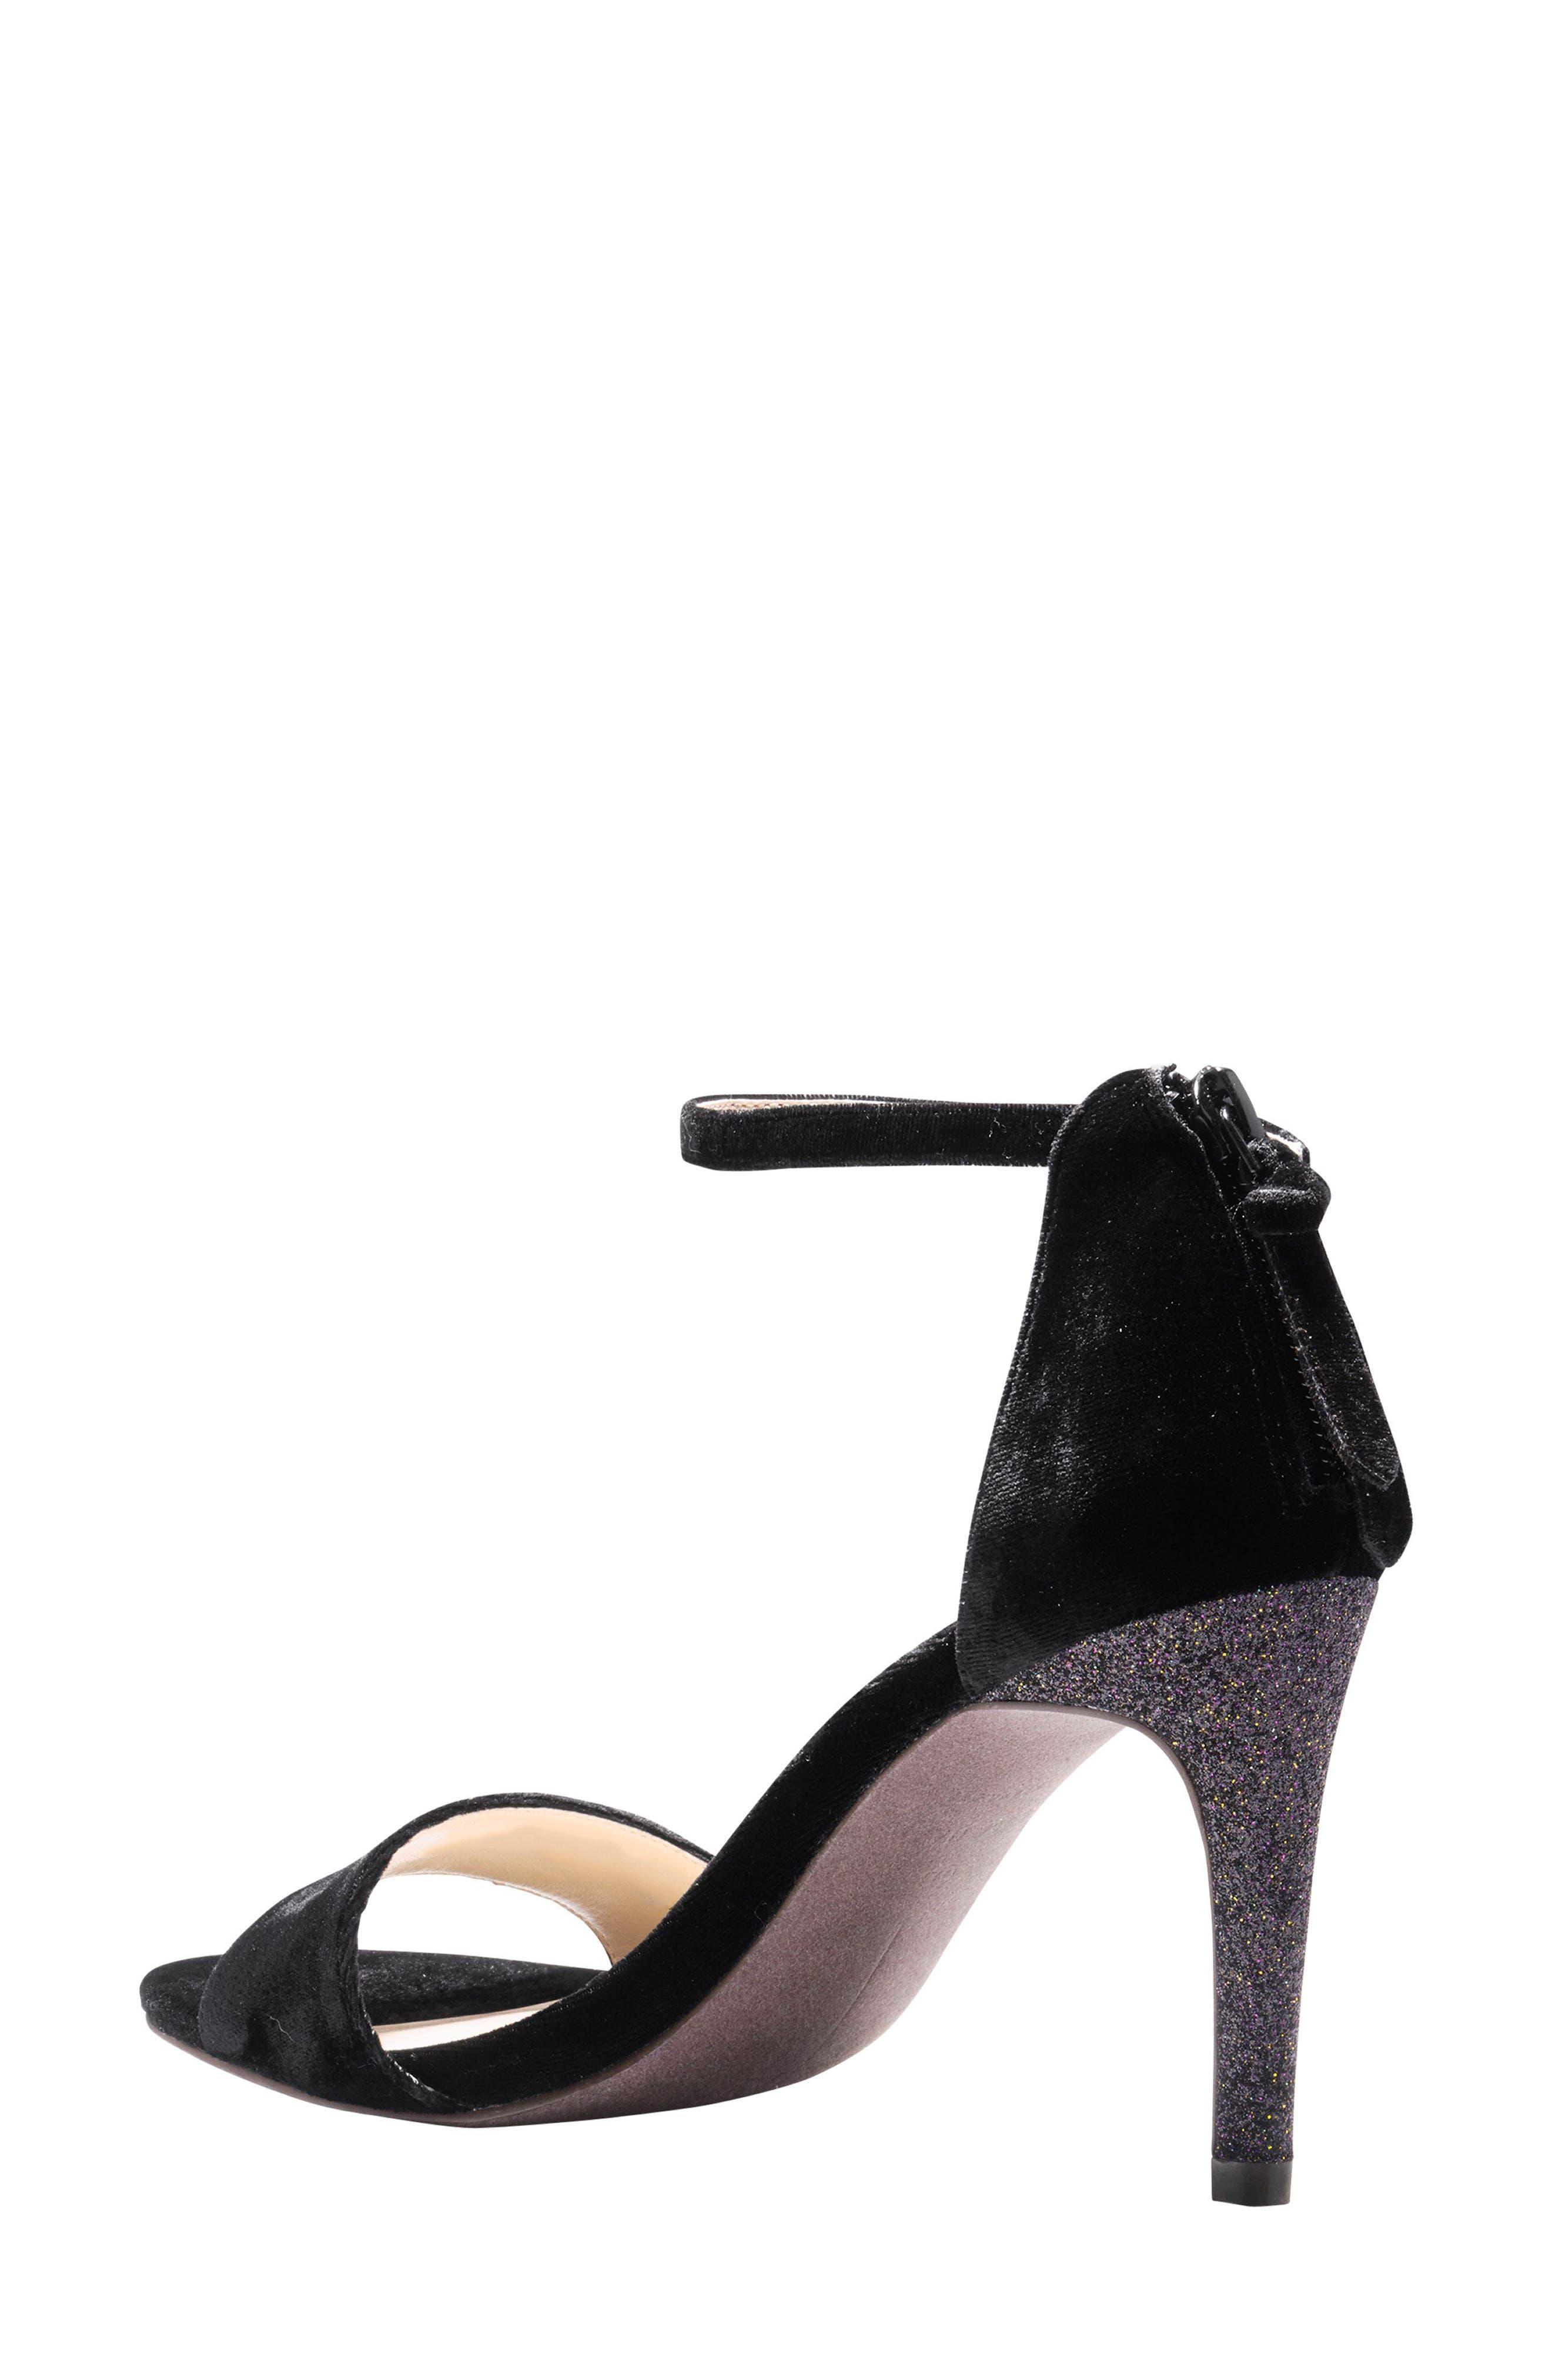 Clara Grand Ankle Strap Sandal,                             Alternate thumbnail 2, color,                             001